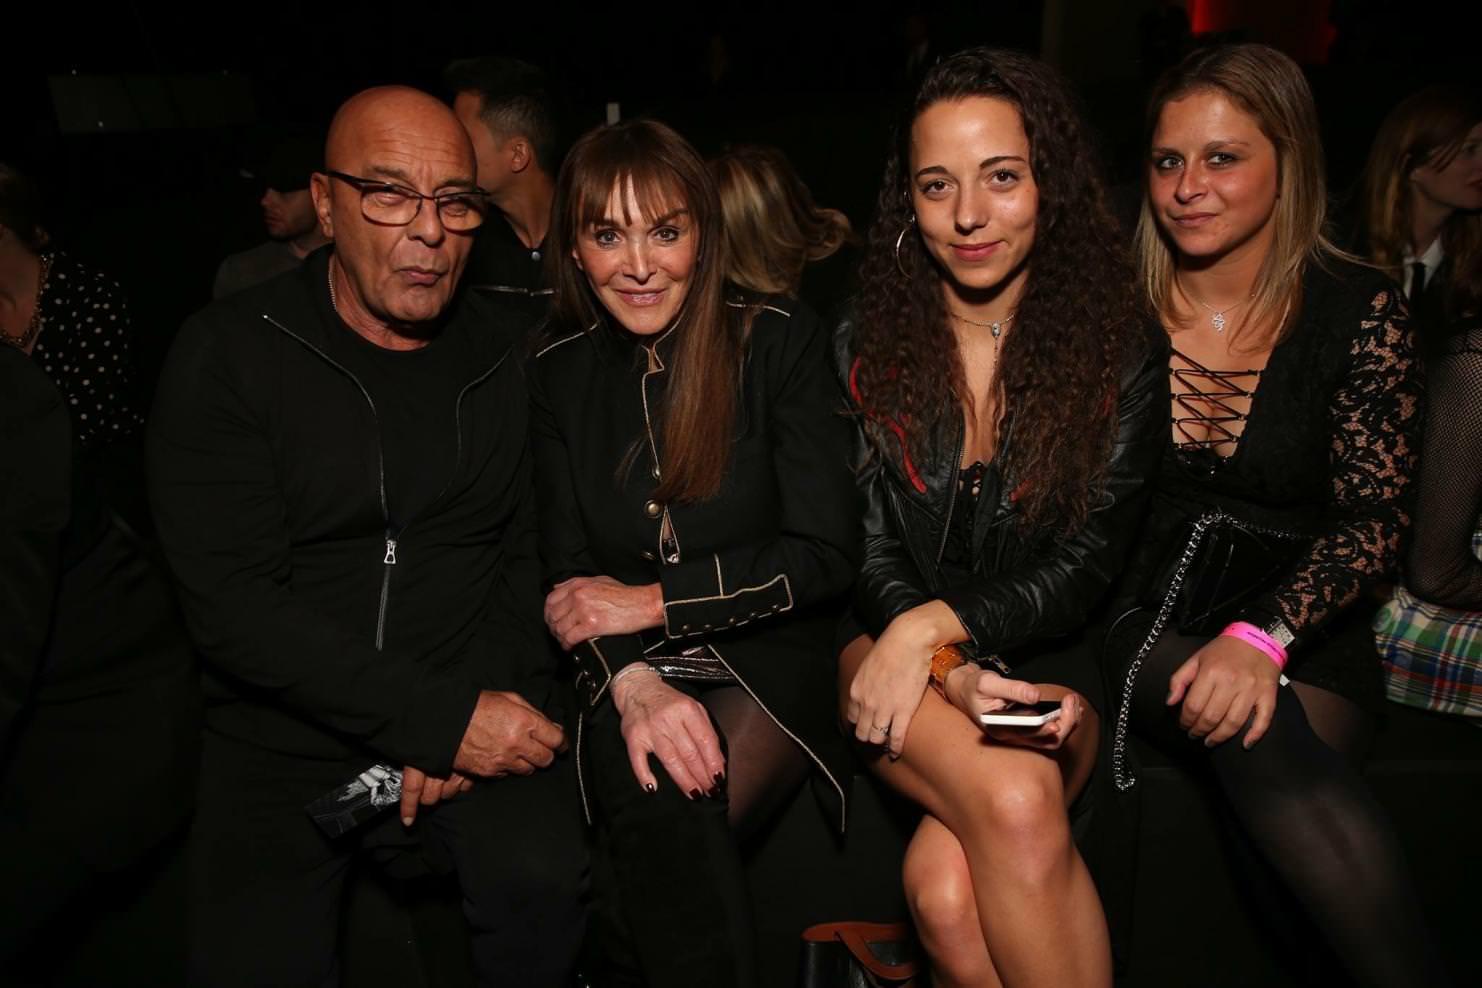 Jean-Baptiste Mondino, Babeth Djian, Mahaut Mondino and Mila Morgensztern (Photo : Saskia Lawaks)